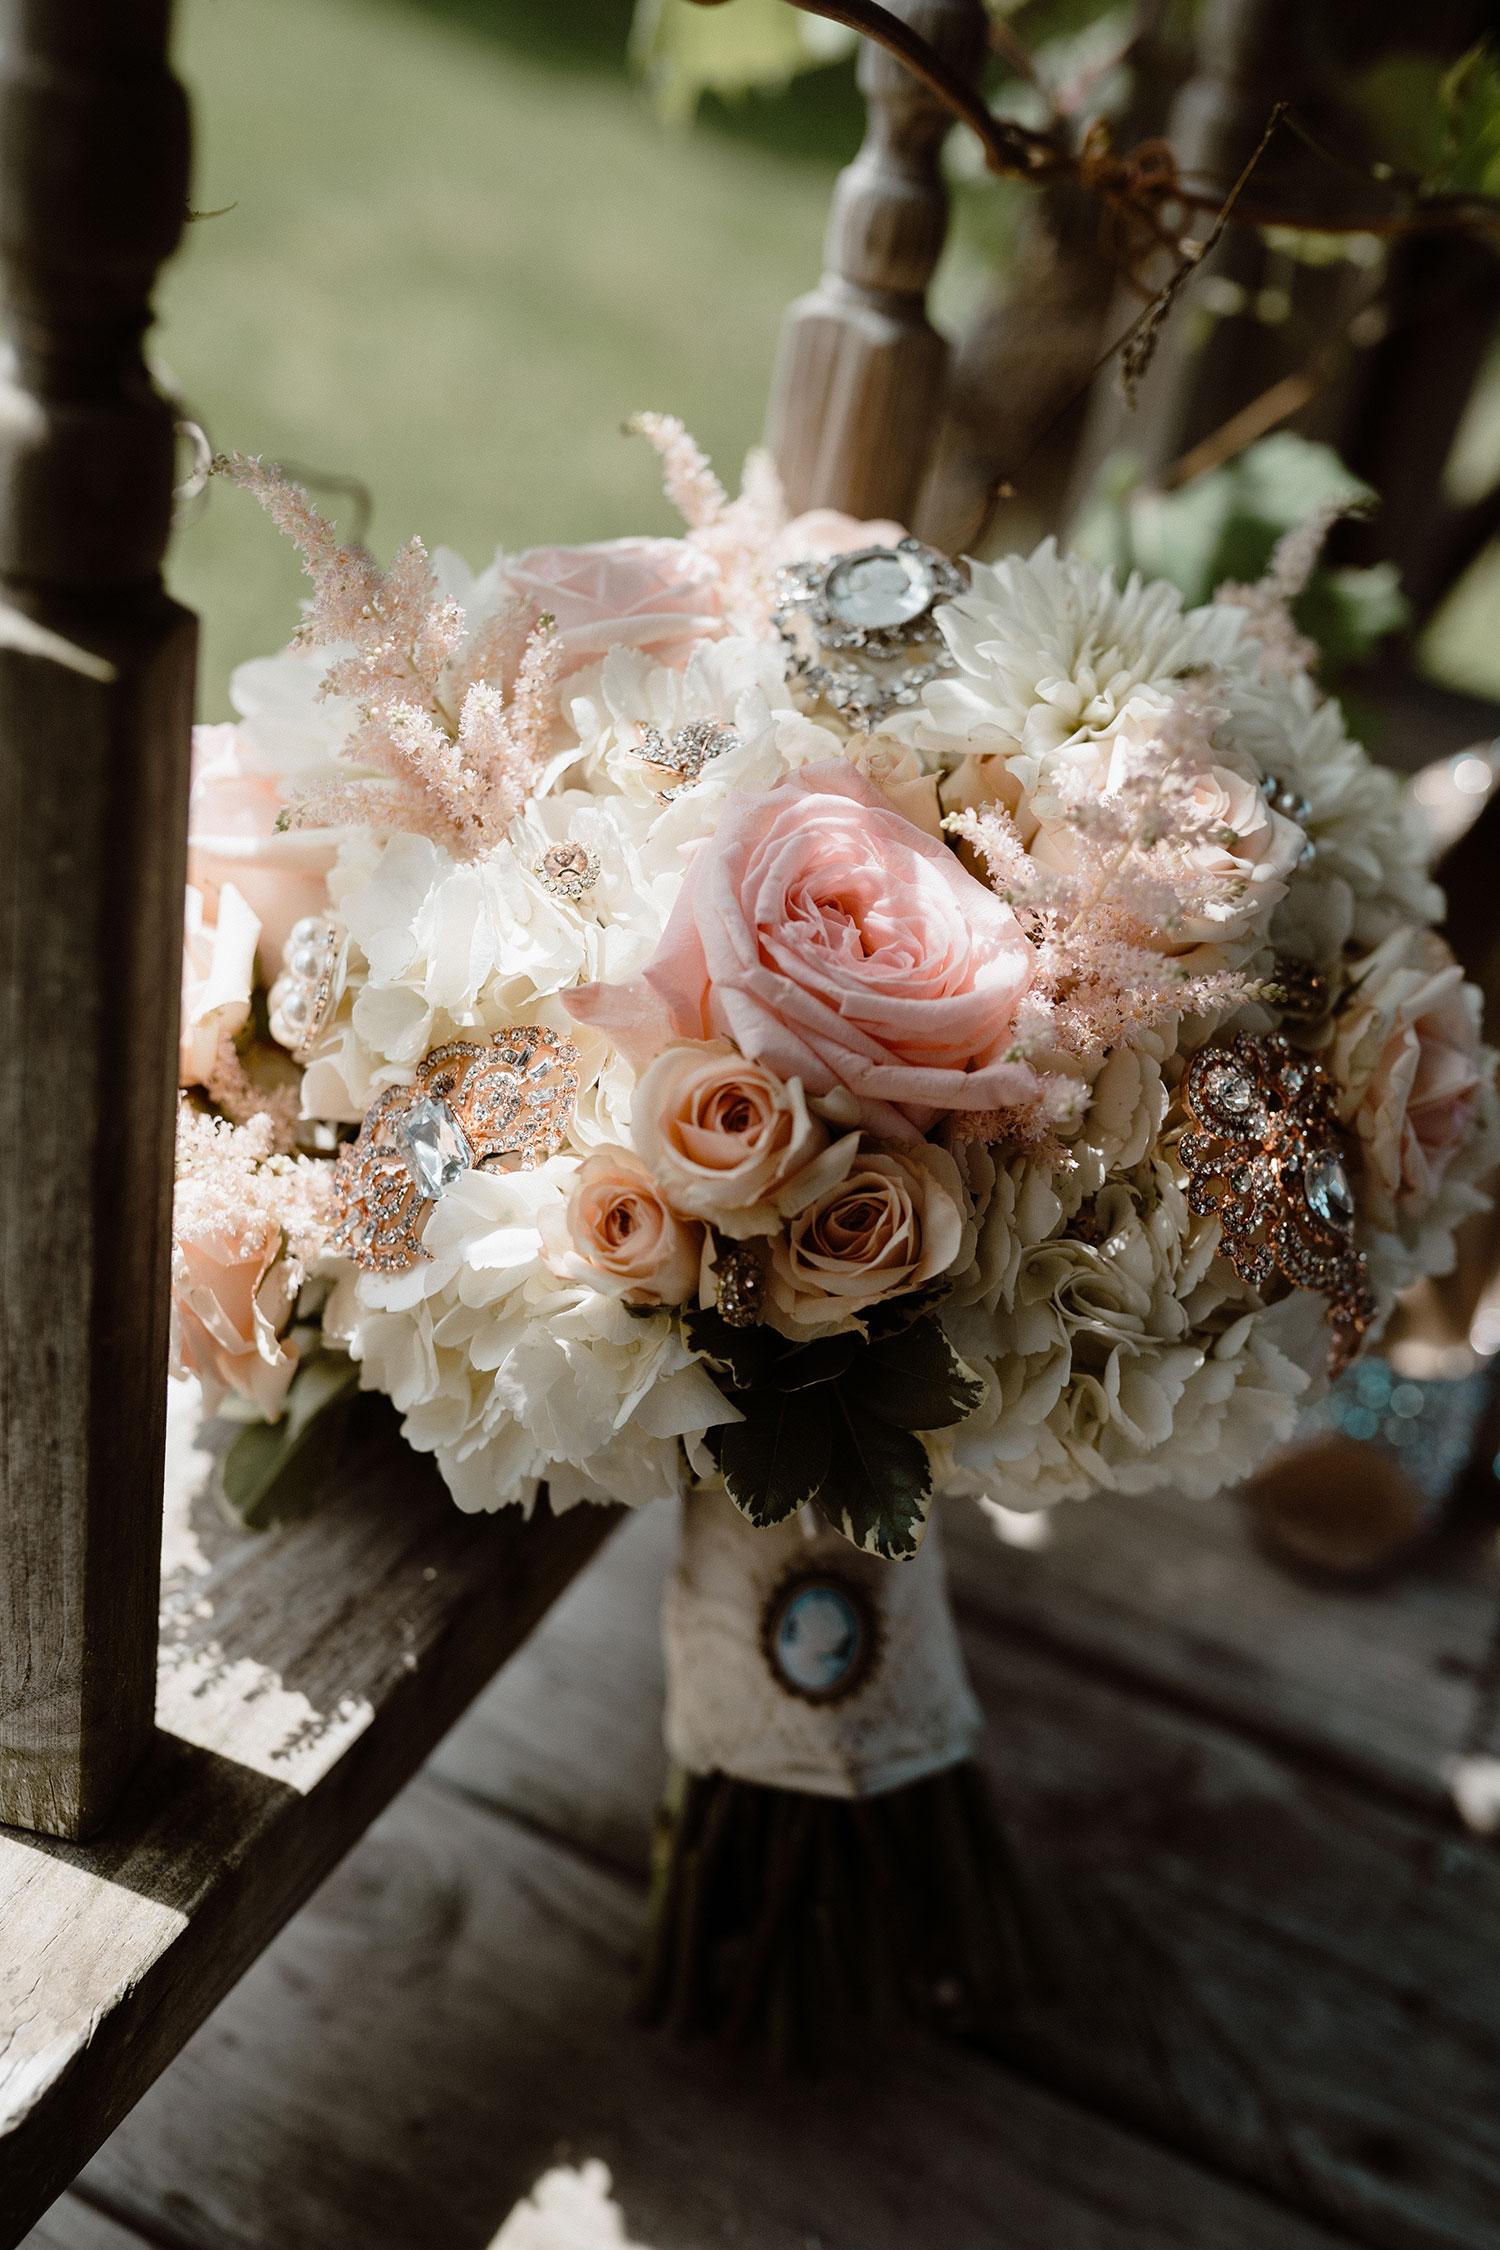 flower-bouquet-sitting-against-deck-detail-shot-wedding-summerset-winery-indianola-iowa-raelyn-ramey-photography.jpg